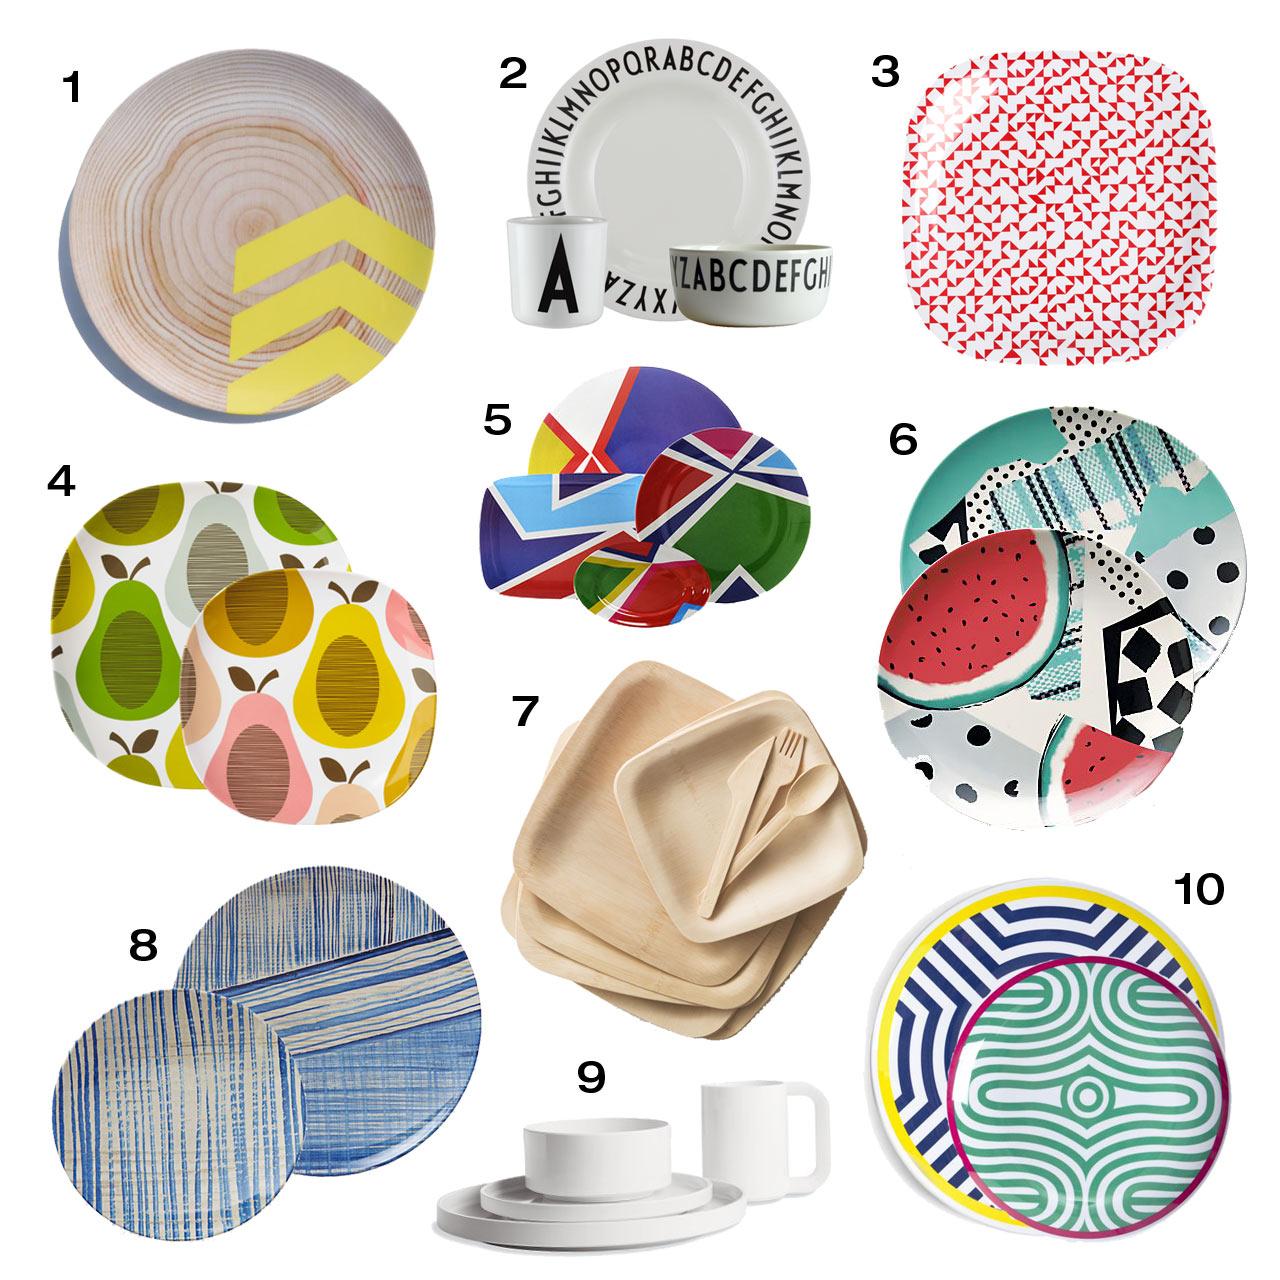 10 Modern Outdoor Dinnerware Options  sc 1 st  Design Milk & 10 Modern Outdoor Dinnerware Options - Design Milk